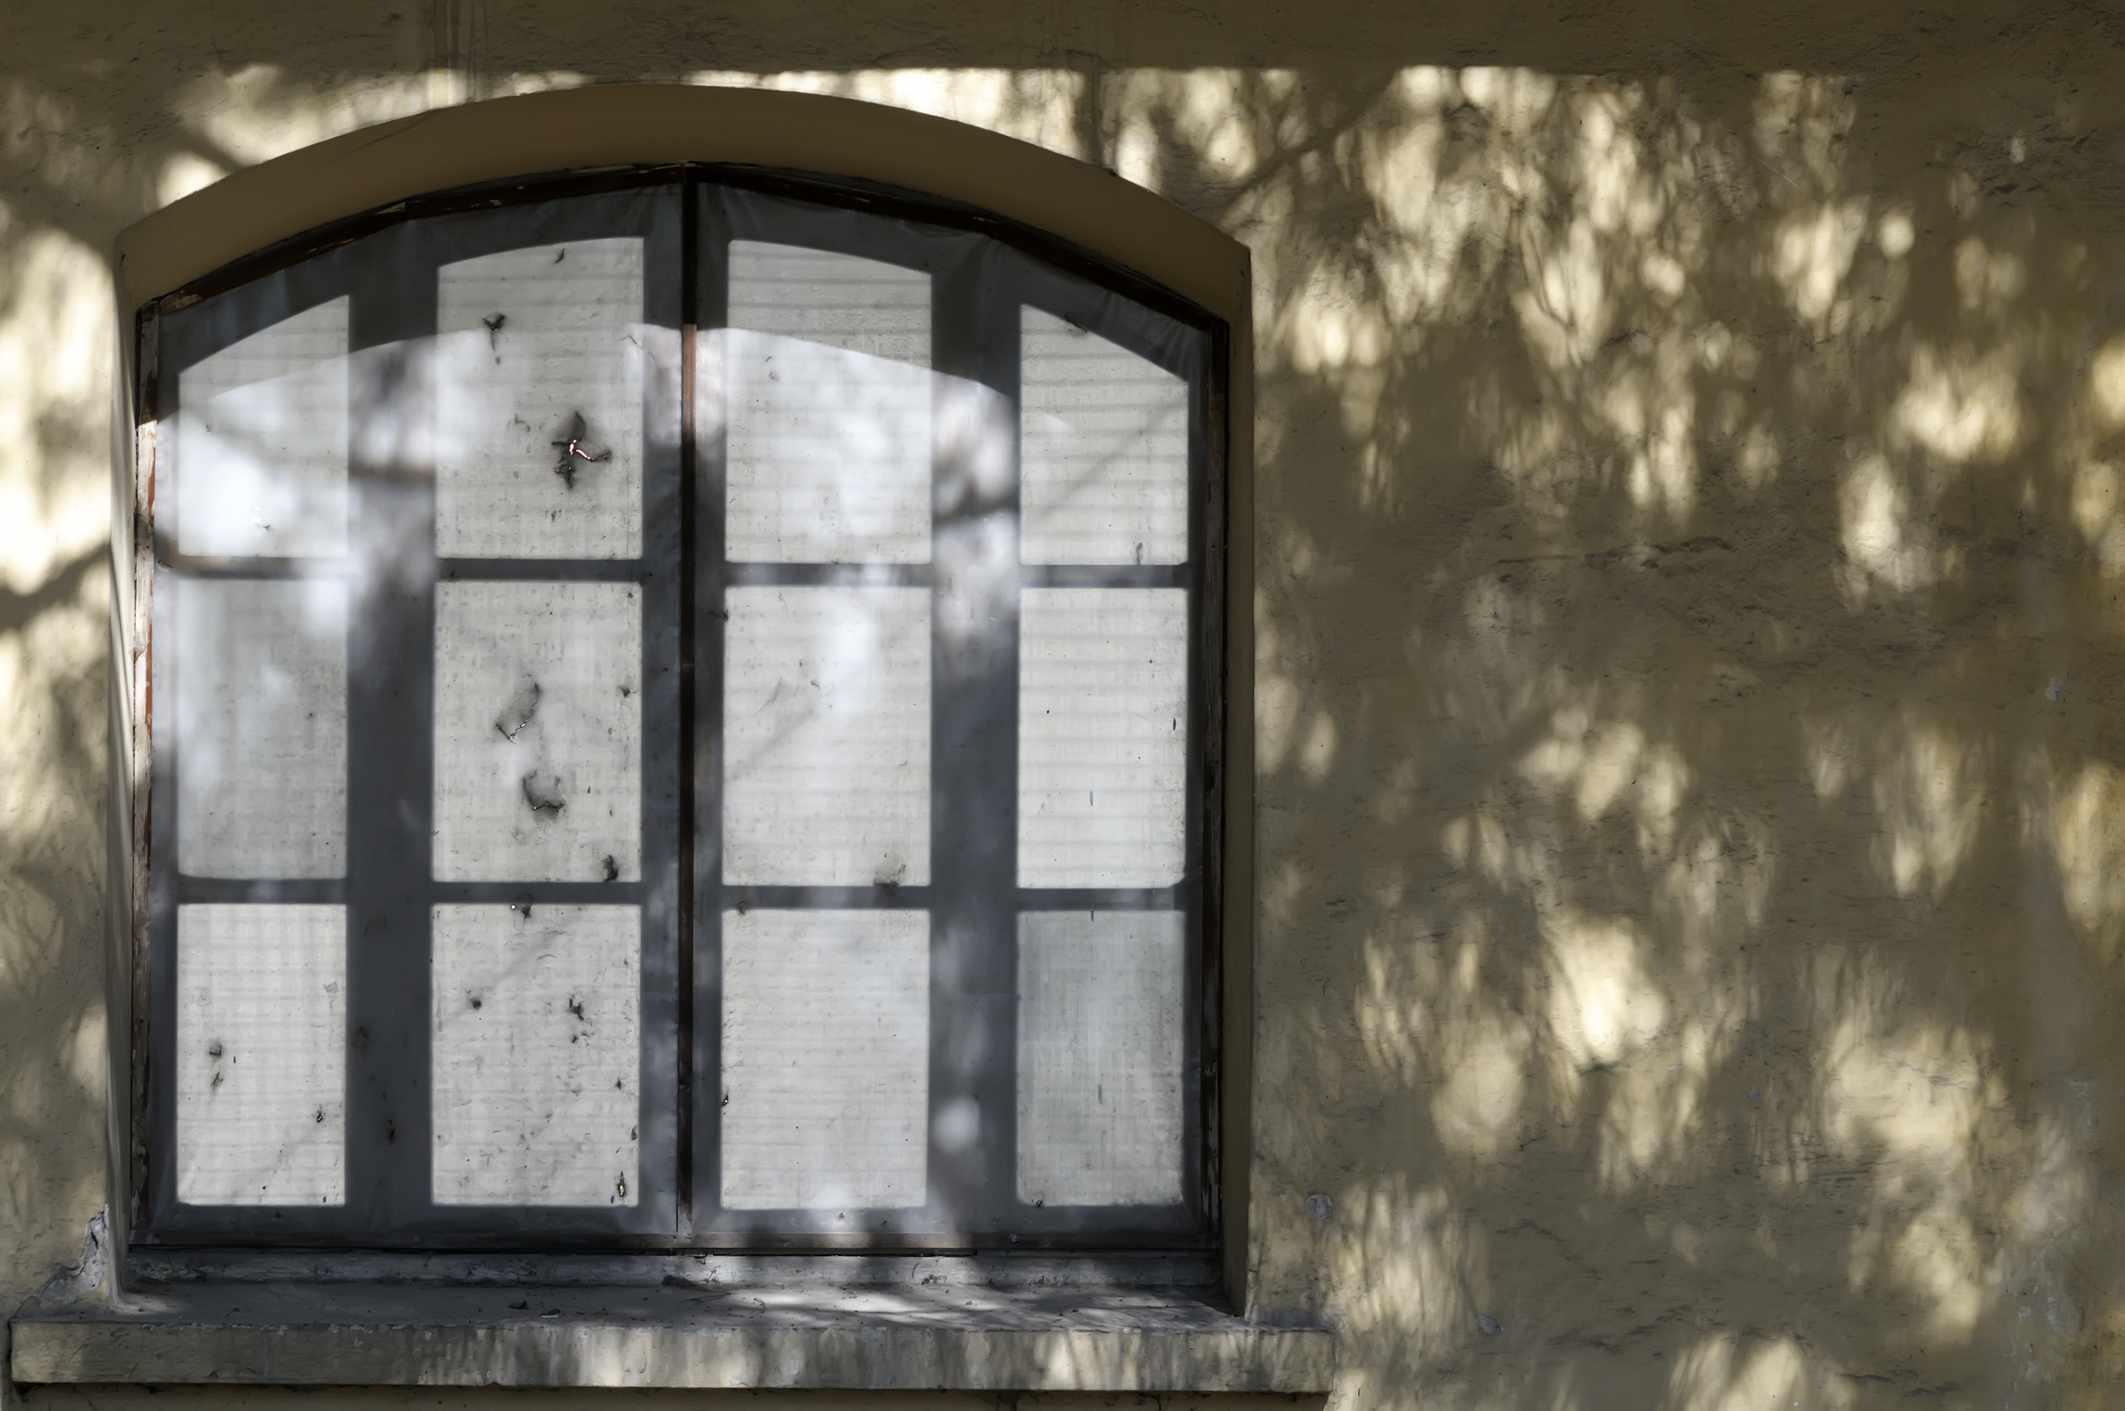 A set of windows on a concrete wall